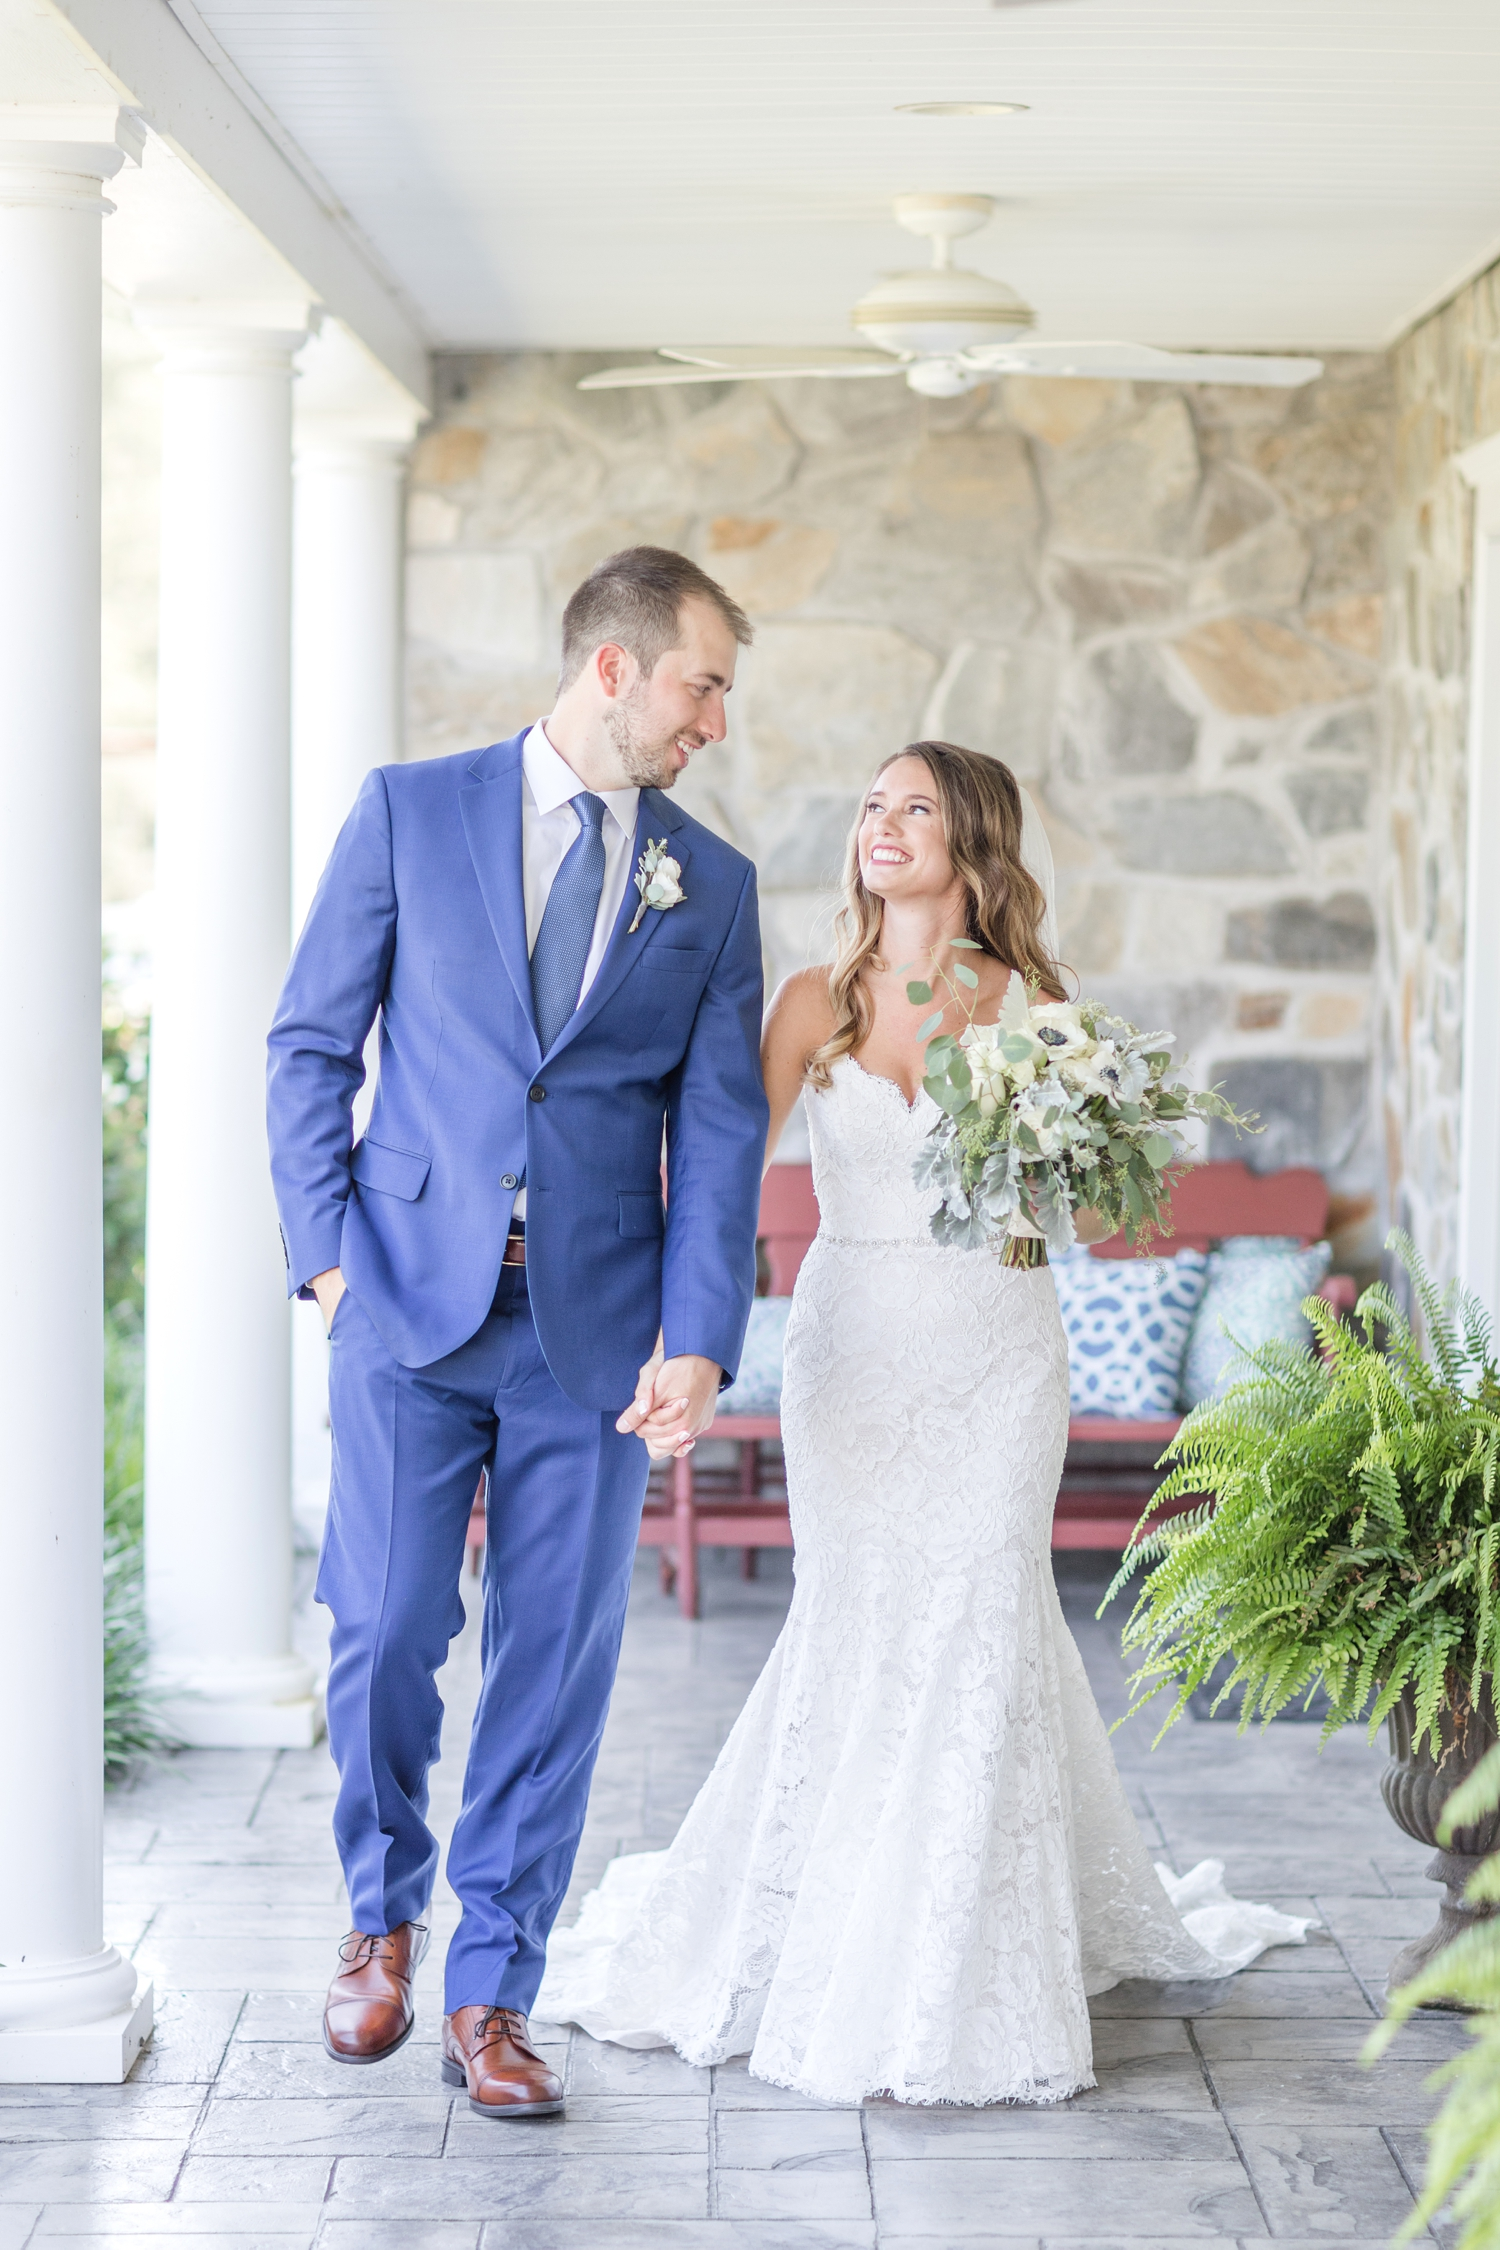 Webb WEDDING HIGHLIGHTS-113_Pond-View-Farm-wedding-Maryland-wedding-photographer-anna-grace-photography-photo.jpg